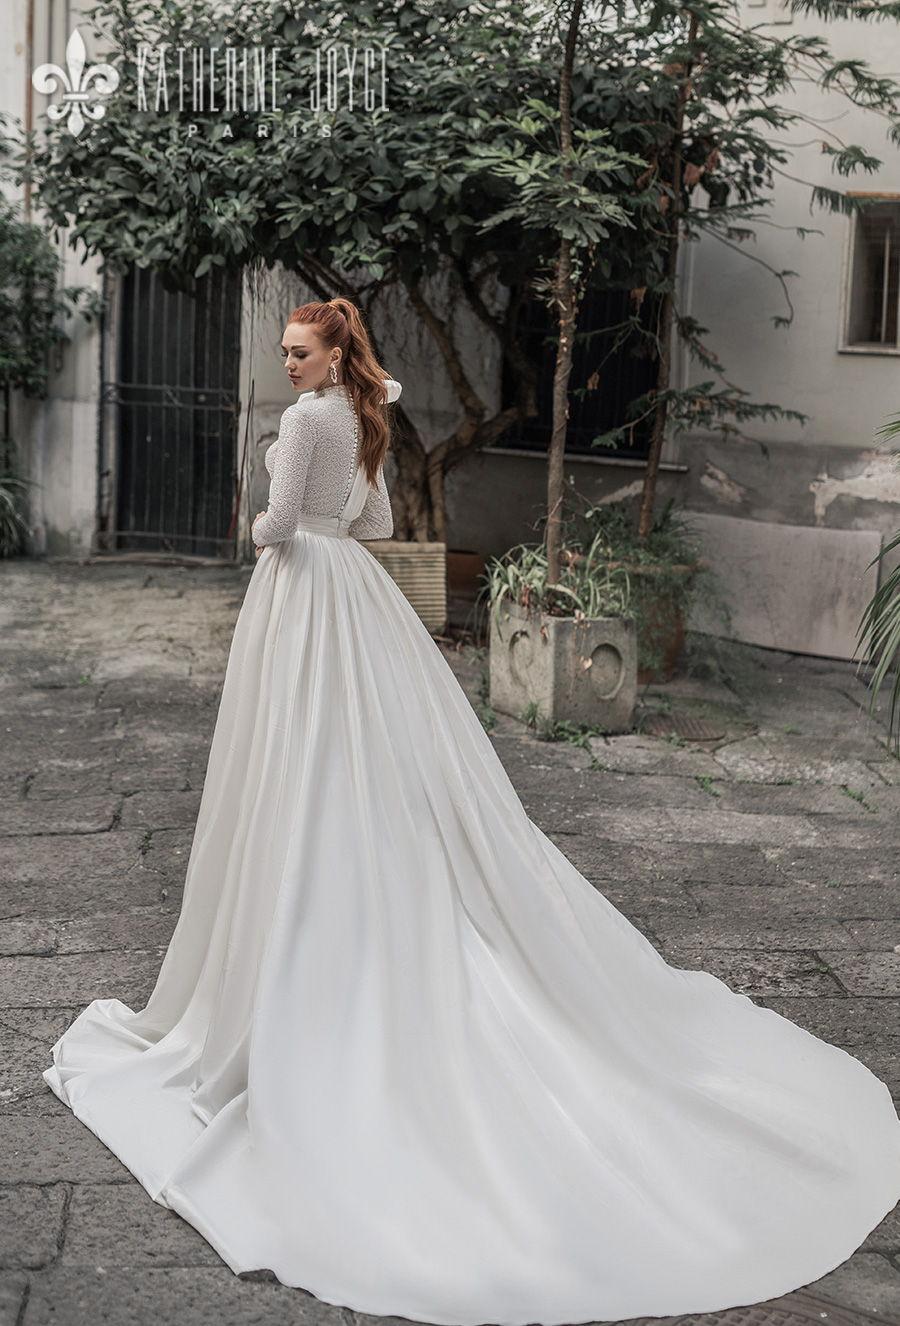 katherine joyce 2021 naples bridal long sleeves high neck full embellishment glitter glamorous ball gown wedding dress covered button back chapel train (mulan) bv